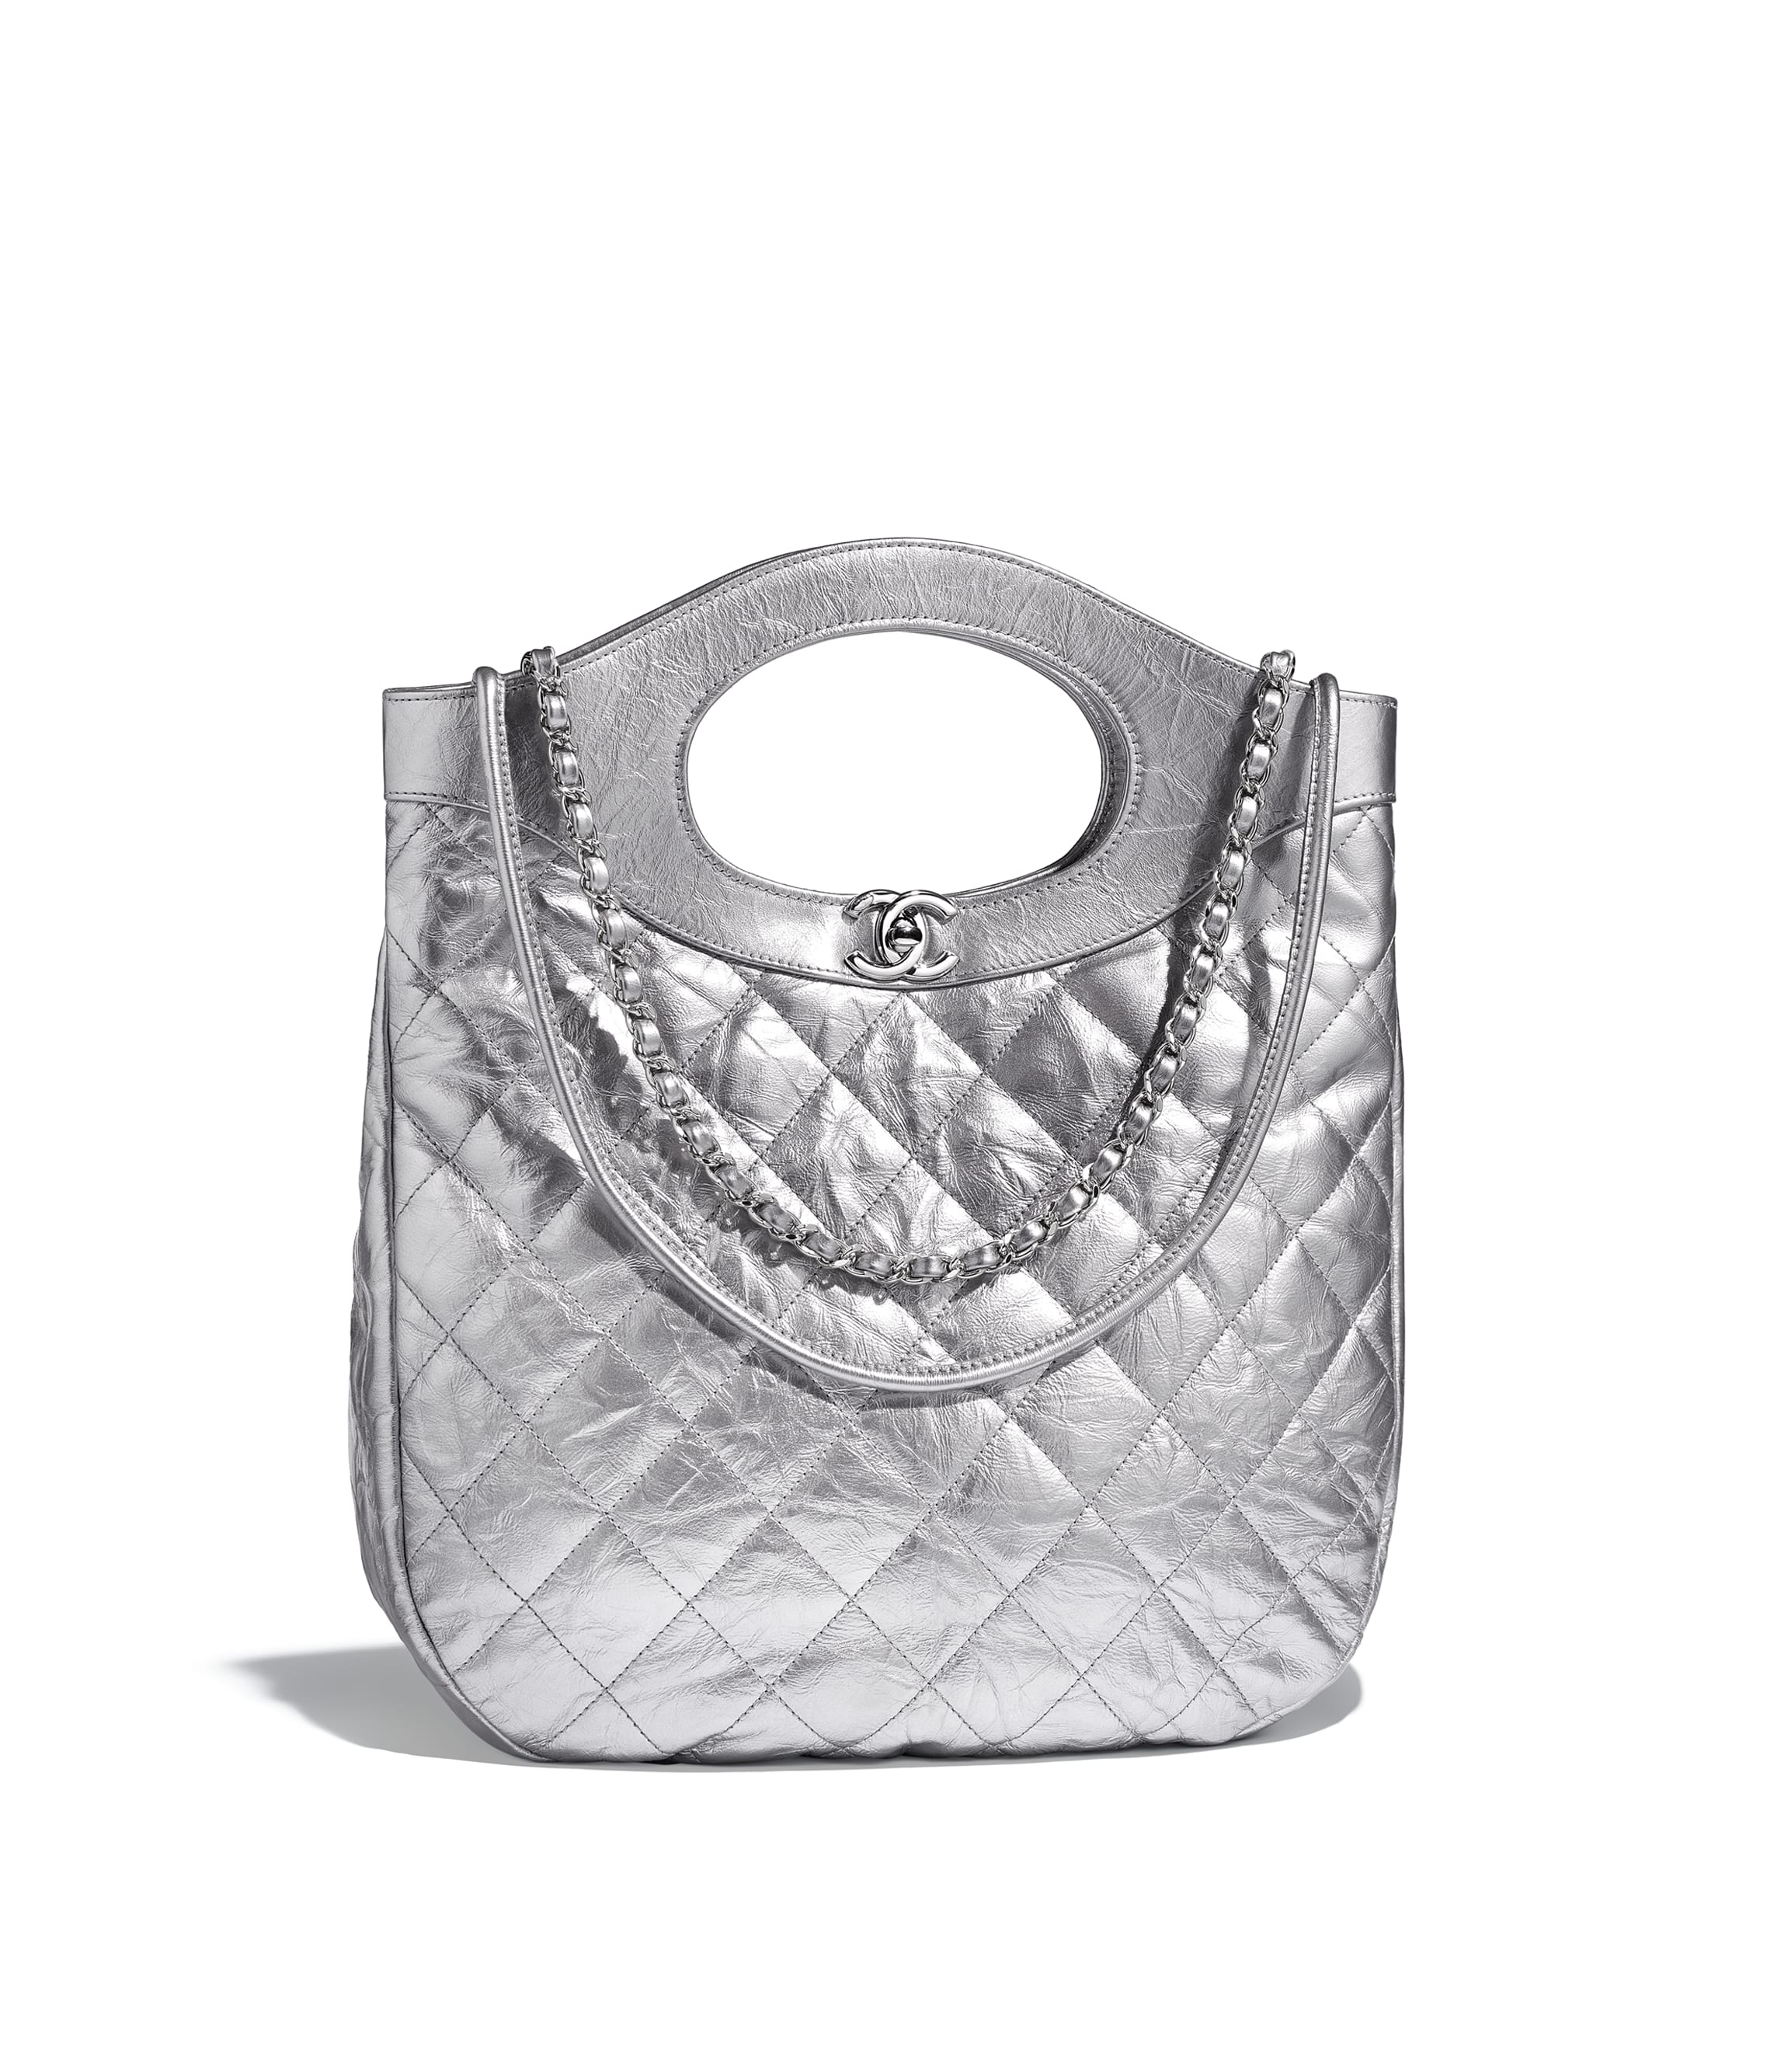 f57fae2ce351 CHANEL 31 Small Shopping Bag, metallic crumpled calfskin & silver ...